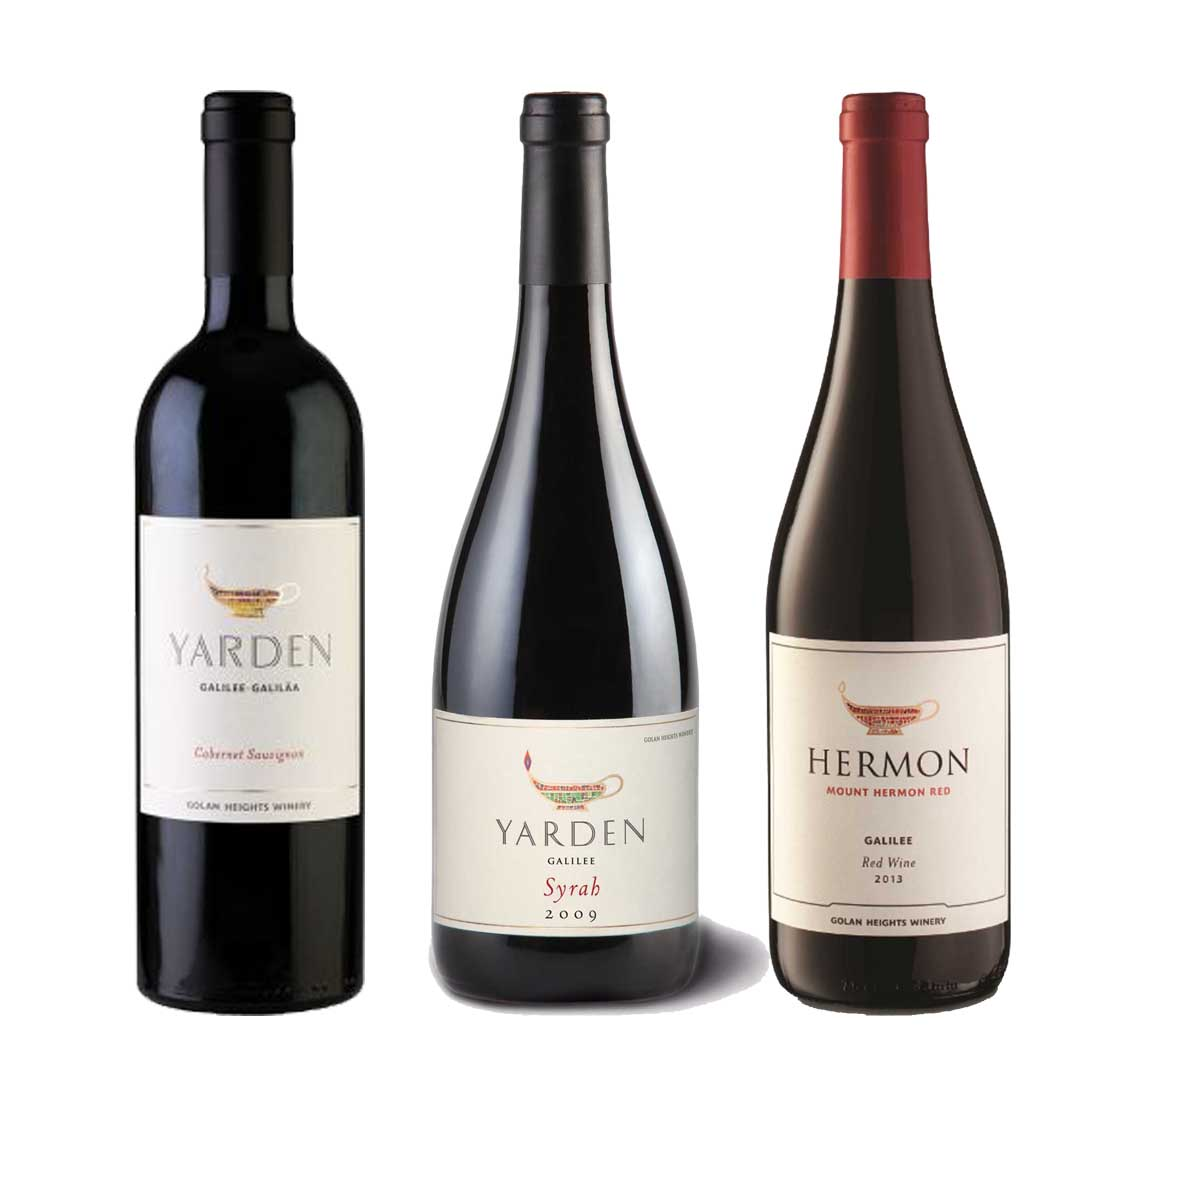 Kit 3x Vinho Tinto Israelense Kosher Yarden Mount Hermon/Cabernet Sauvginon/Syrah